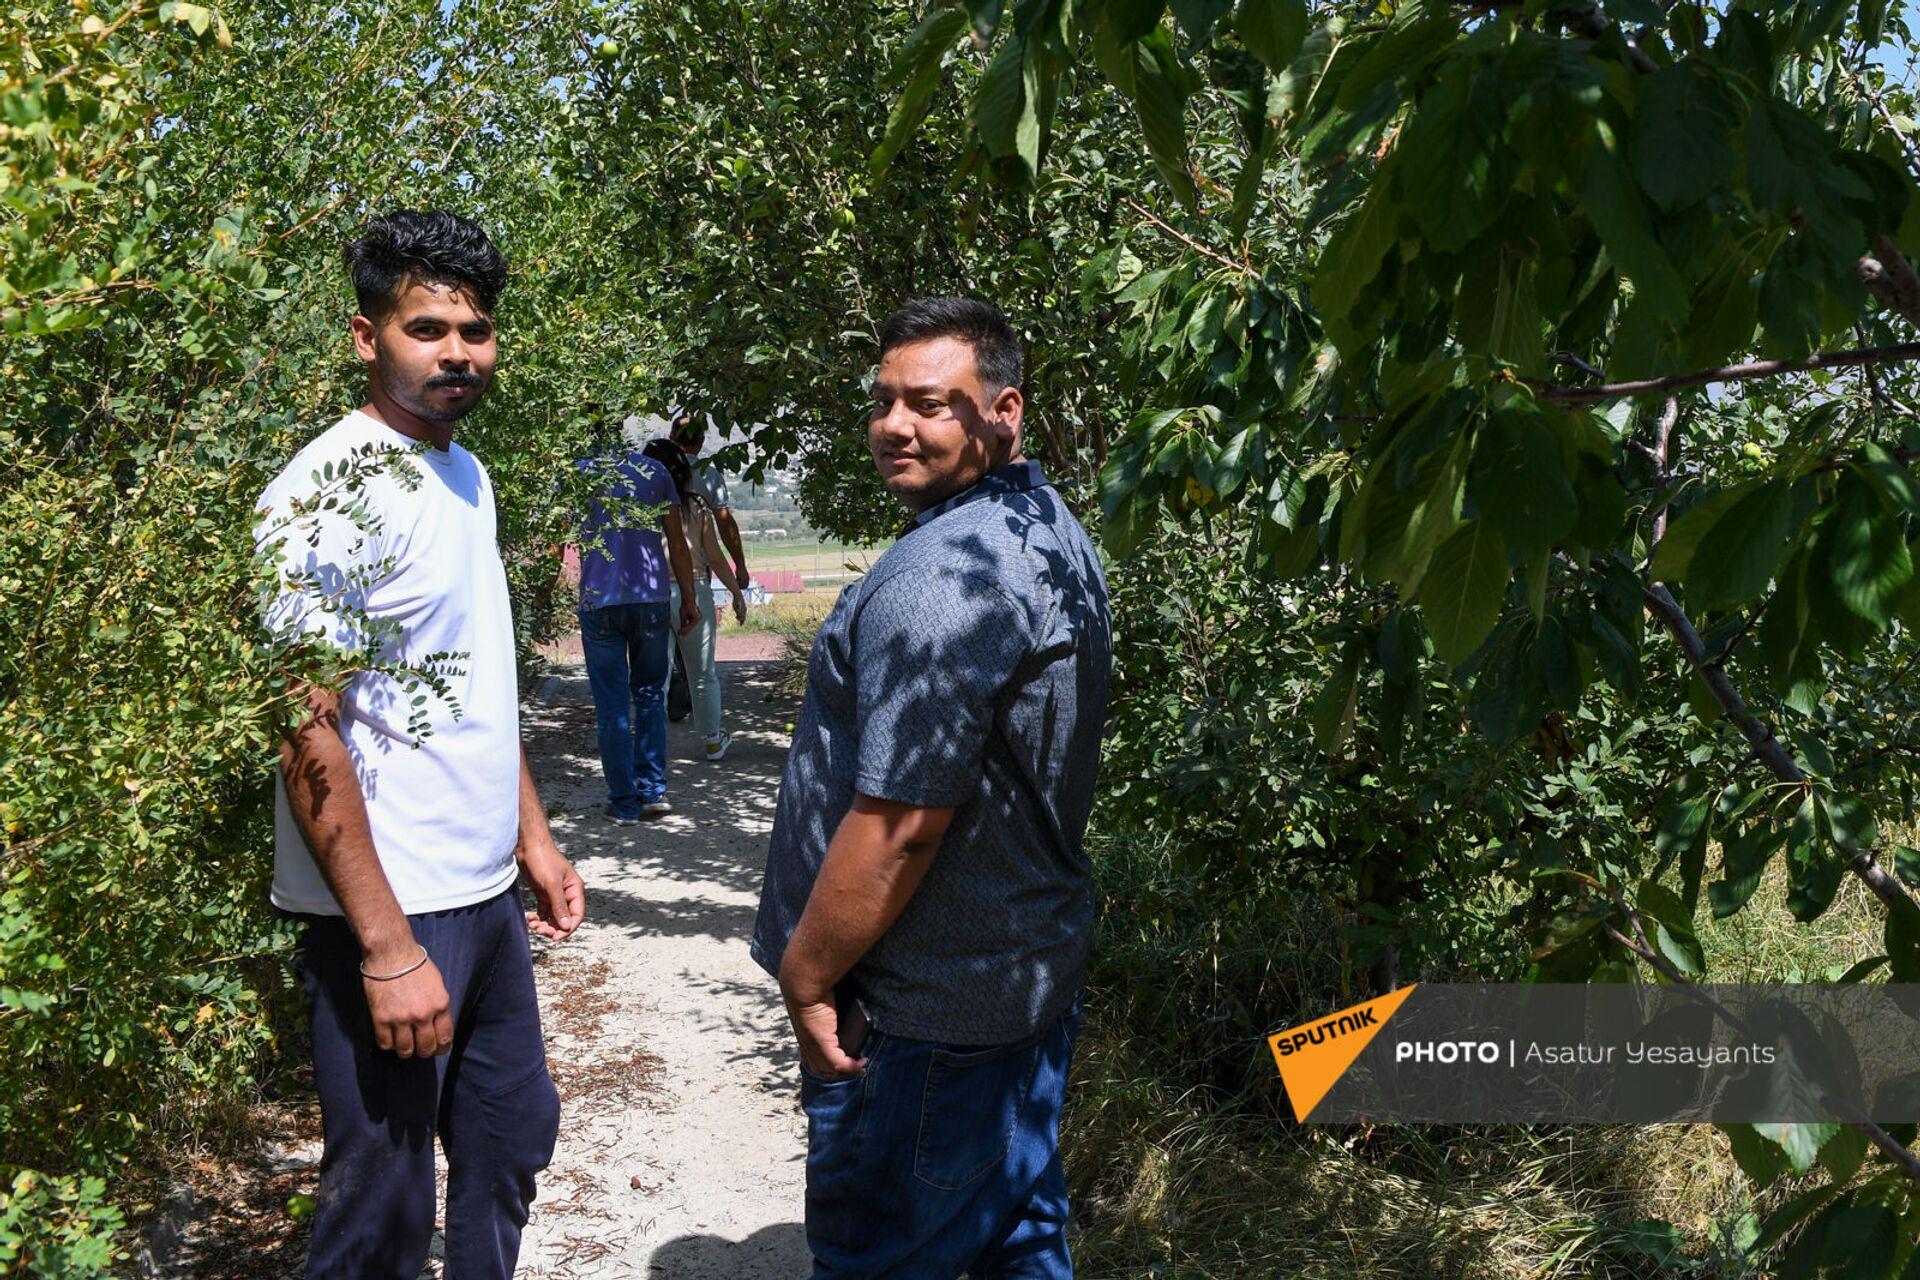 24-летний Кака и 26-летний Шаке на ферме компании Агрохолдинг - Sputnik Армения, 1920, 14.09.2021